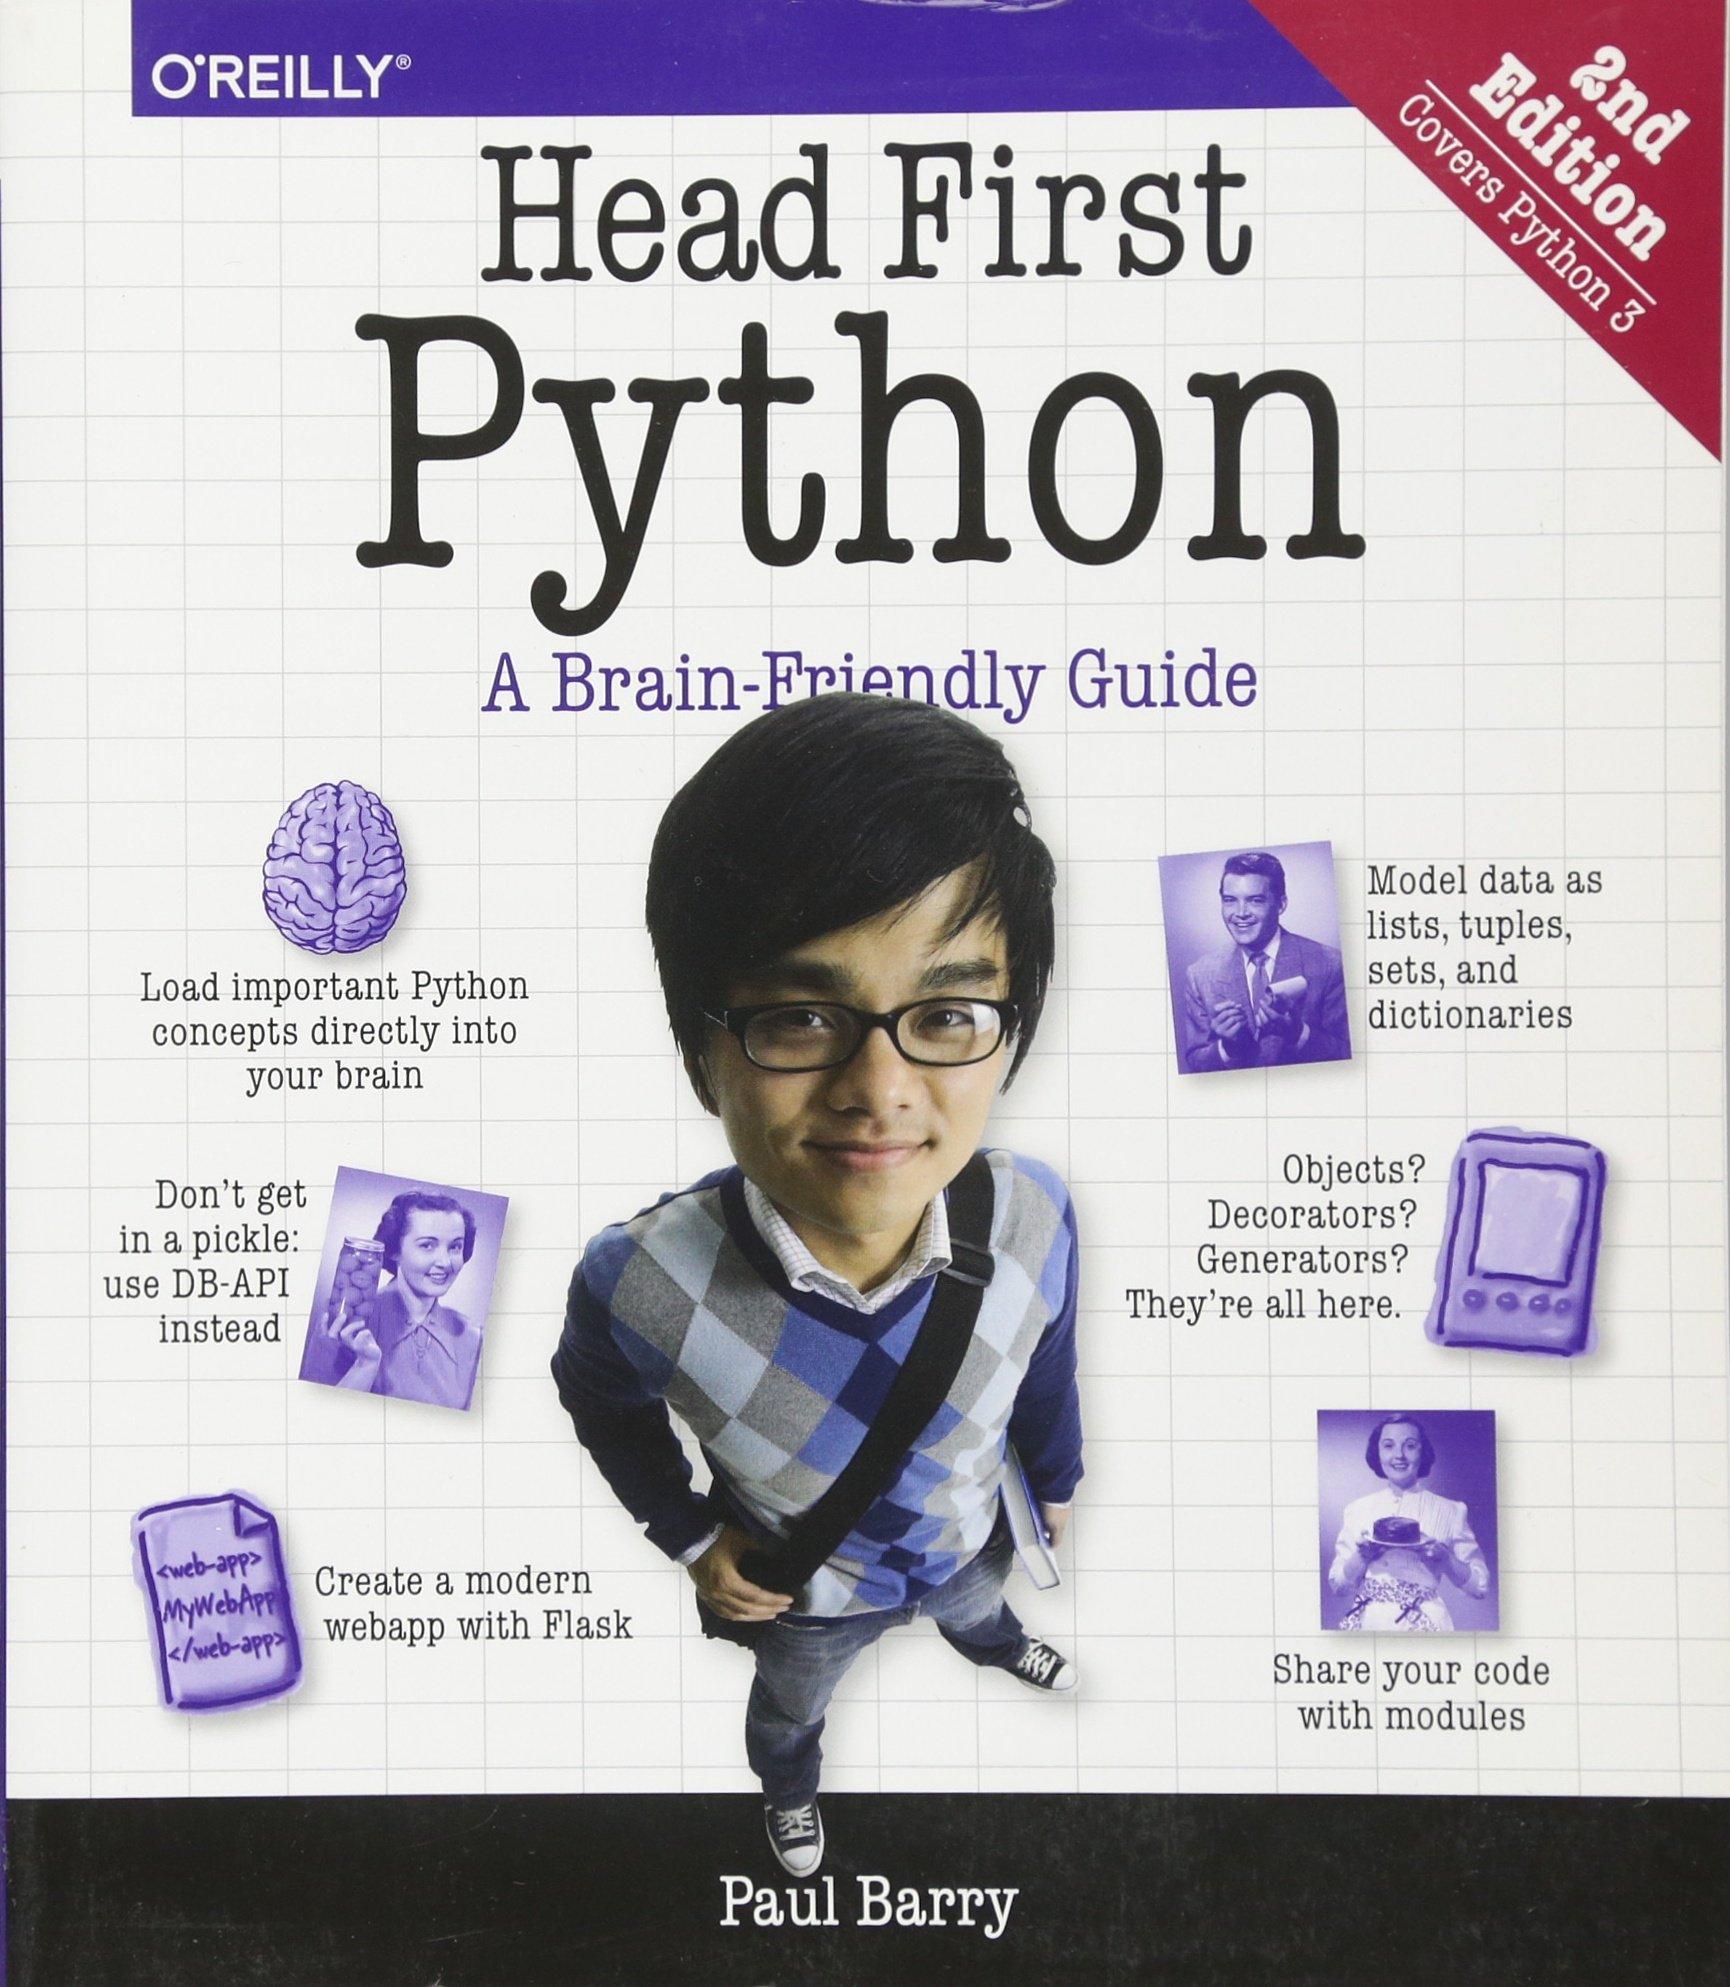 Head First Python: A Brain-Friendly Guide by O'Reilly Media